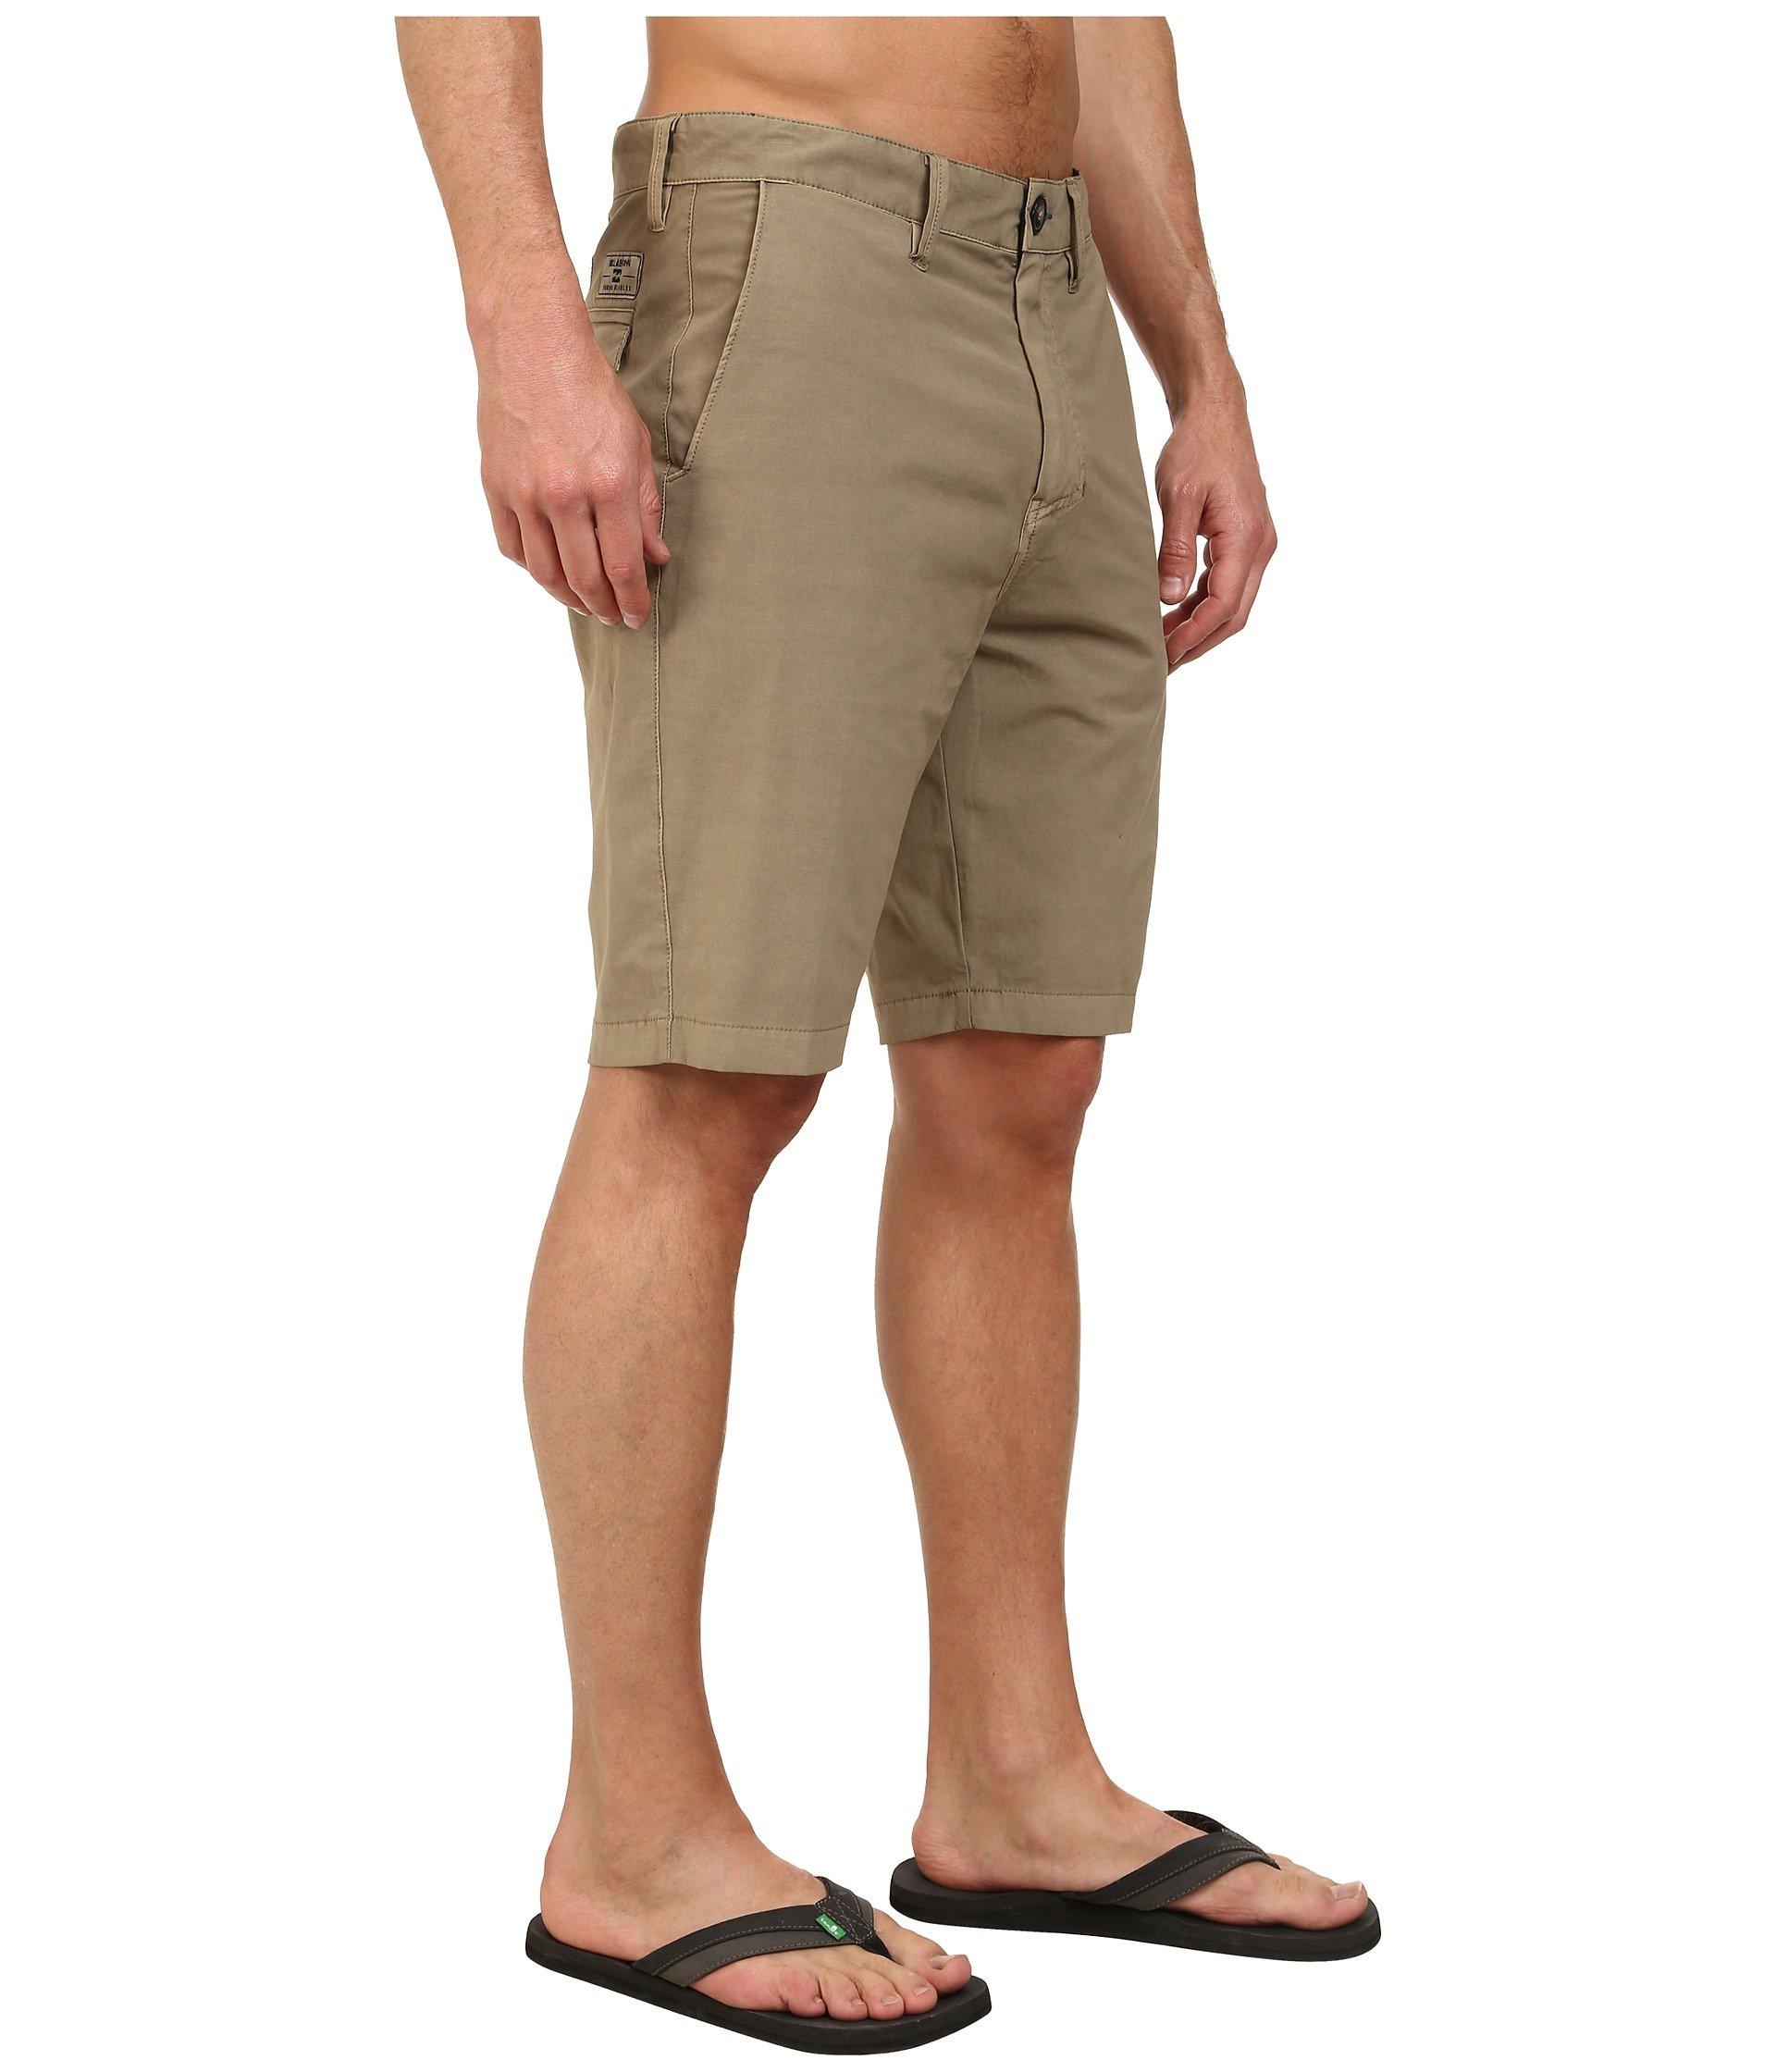 Light Khaki Billabong Boys New Order X Overdye Submersible Shorts